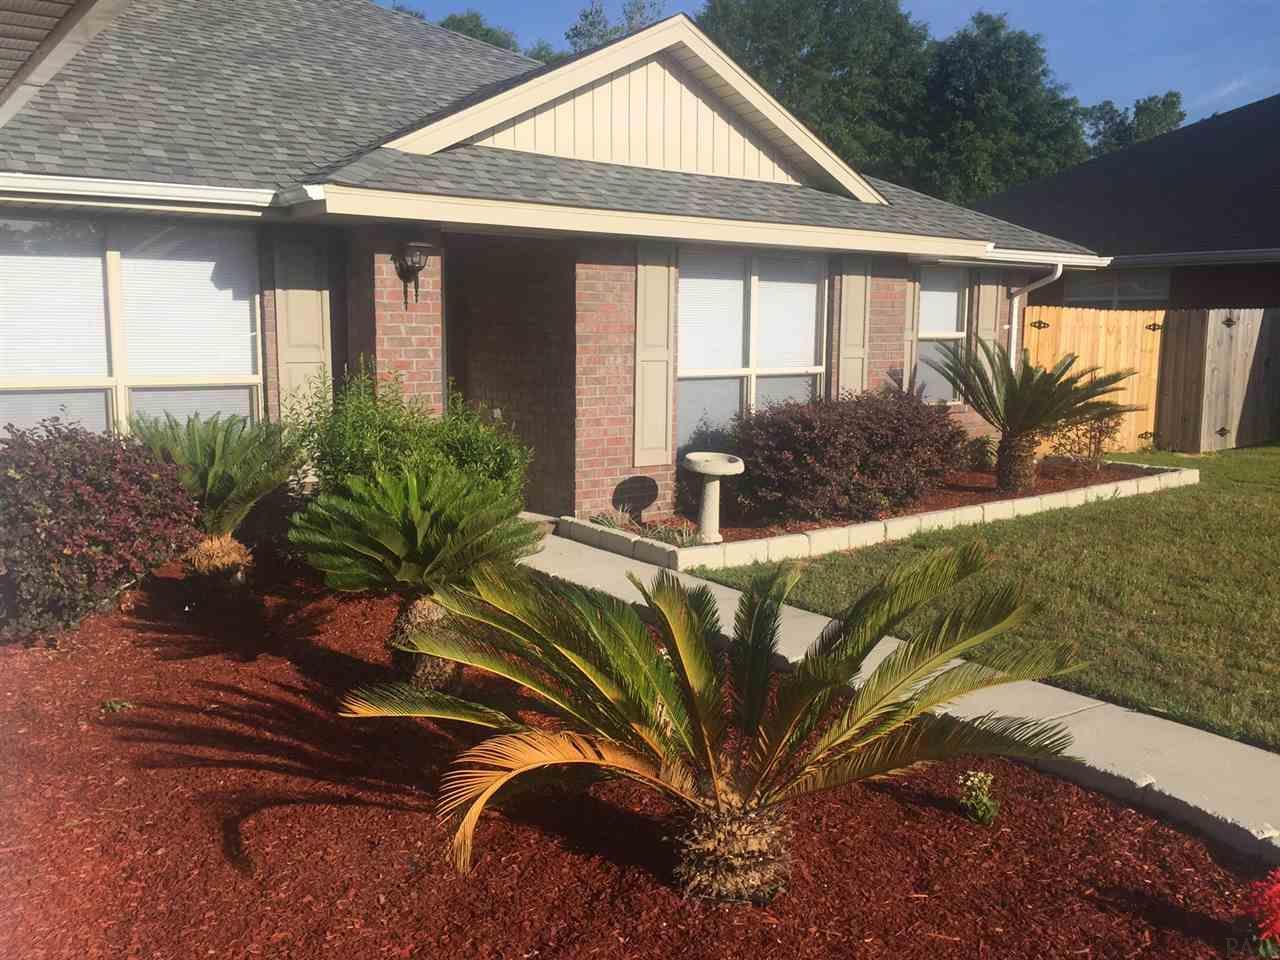 9739 Harlington St, Cantonment, FL 32533